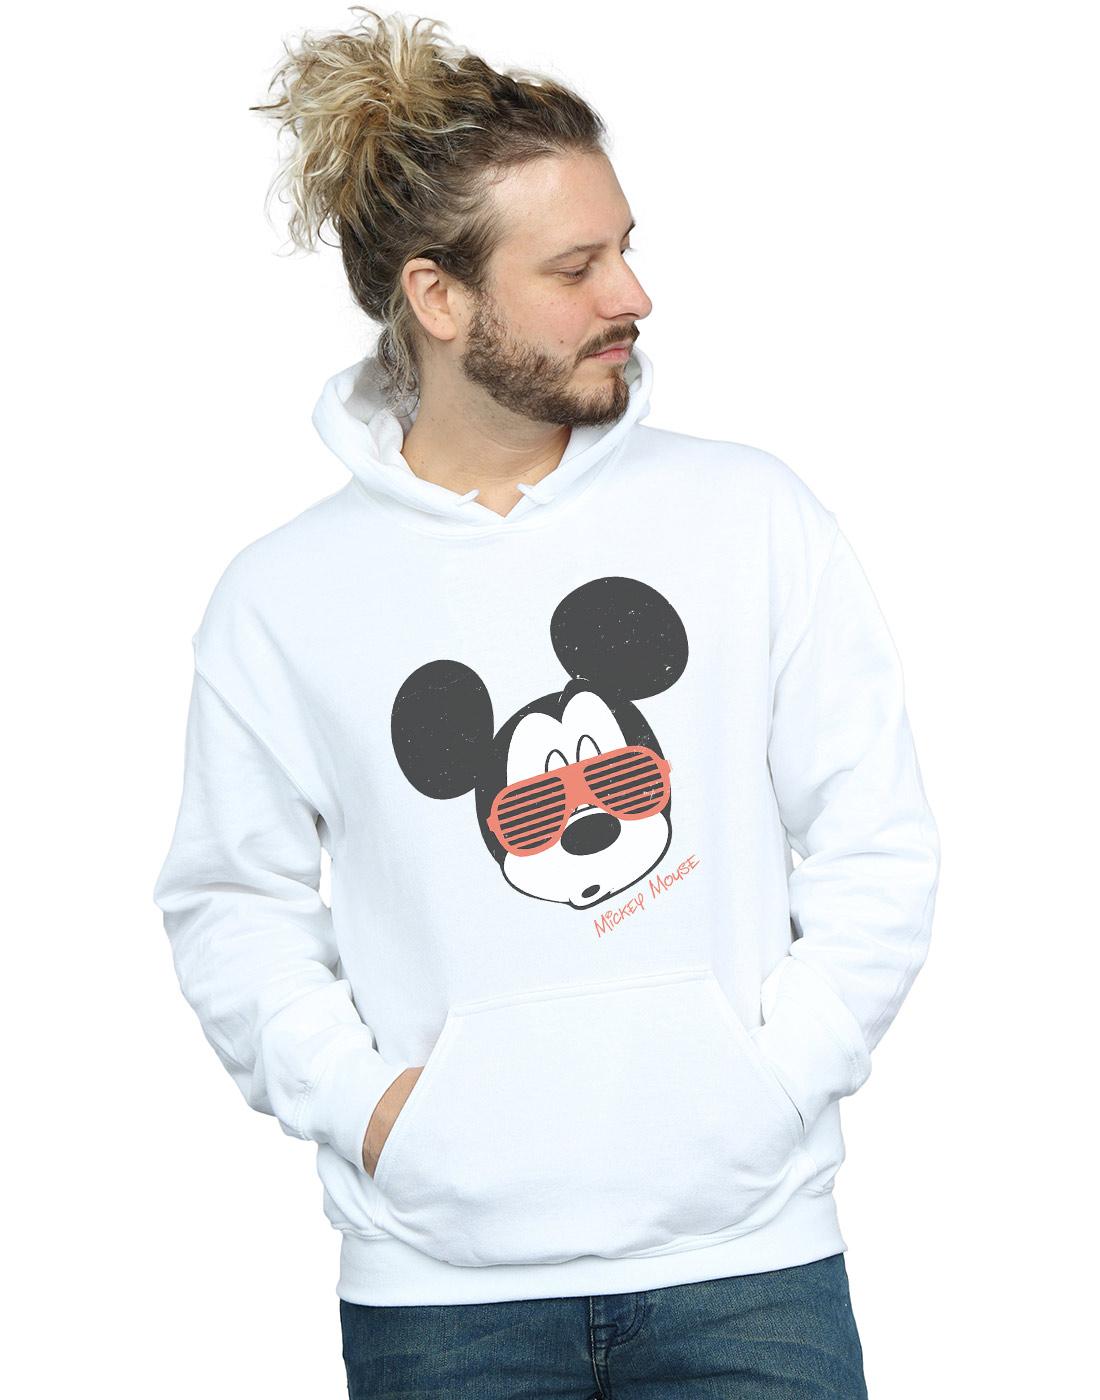 Disney-Hombre-Mickey-Mouse-Sunglasses-Capucha